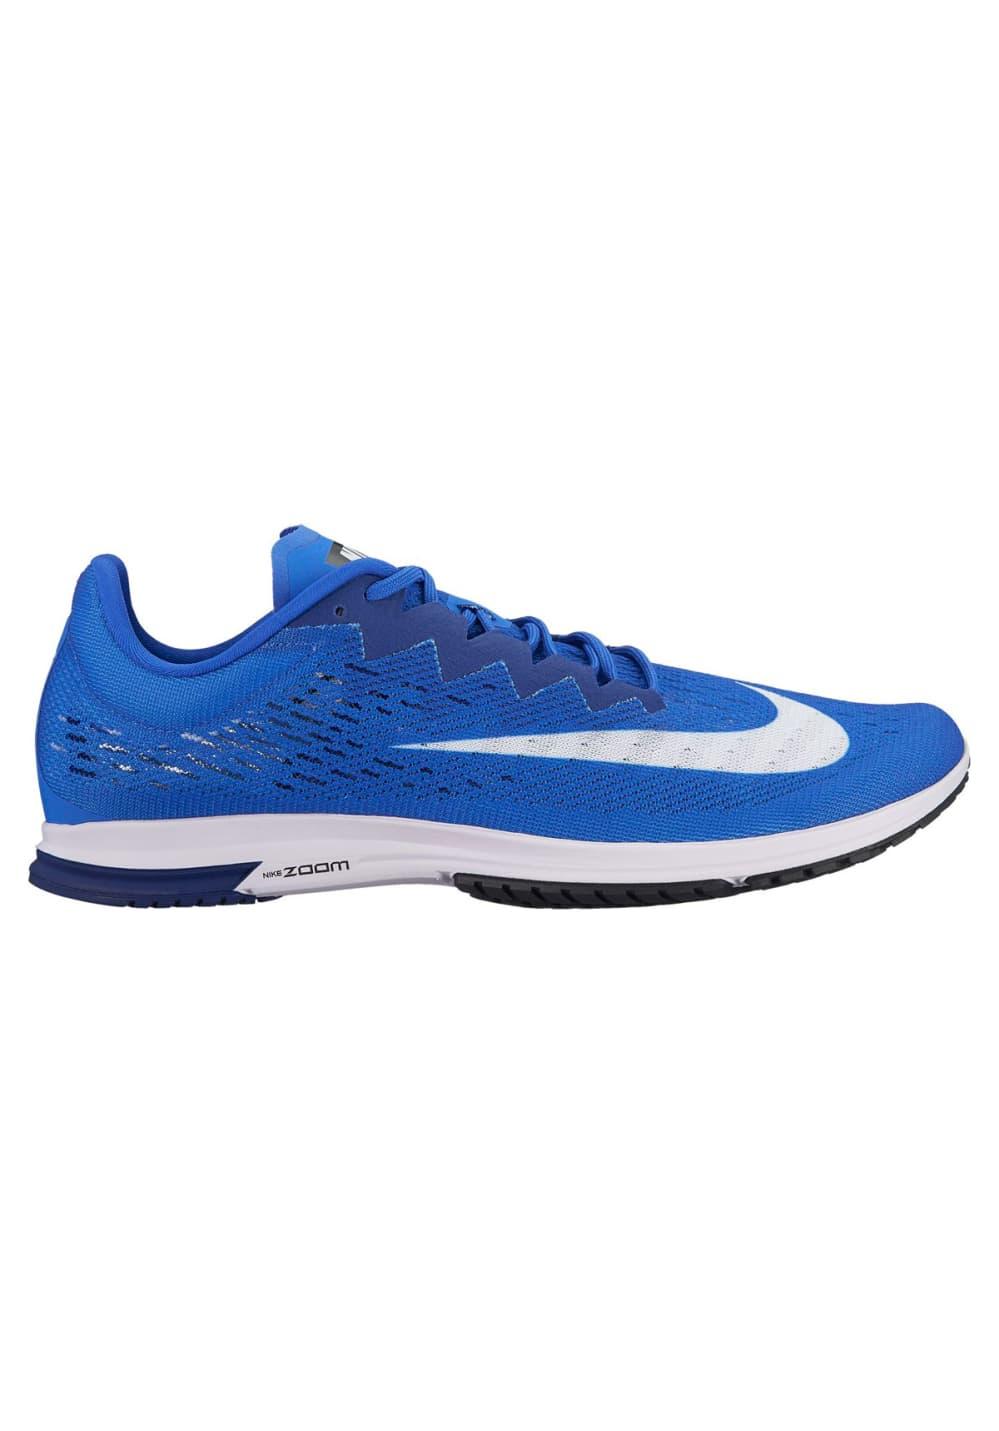 Running Lt 4 Chaussures Zoom Bleu Air Nike Streak fYg6yb7